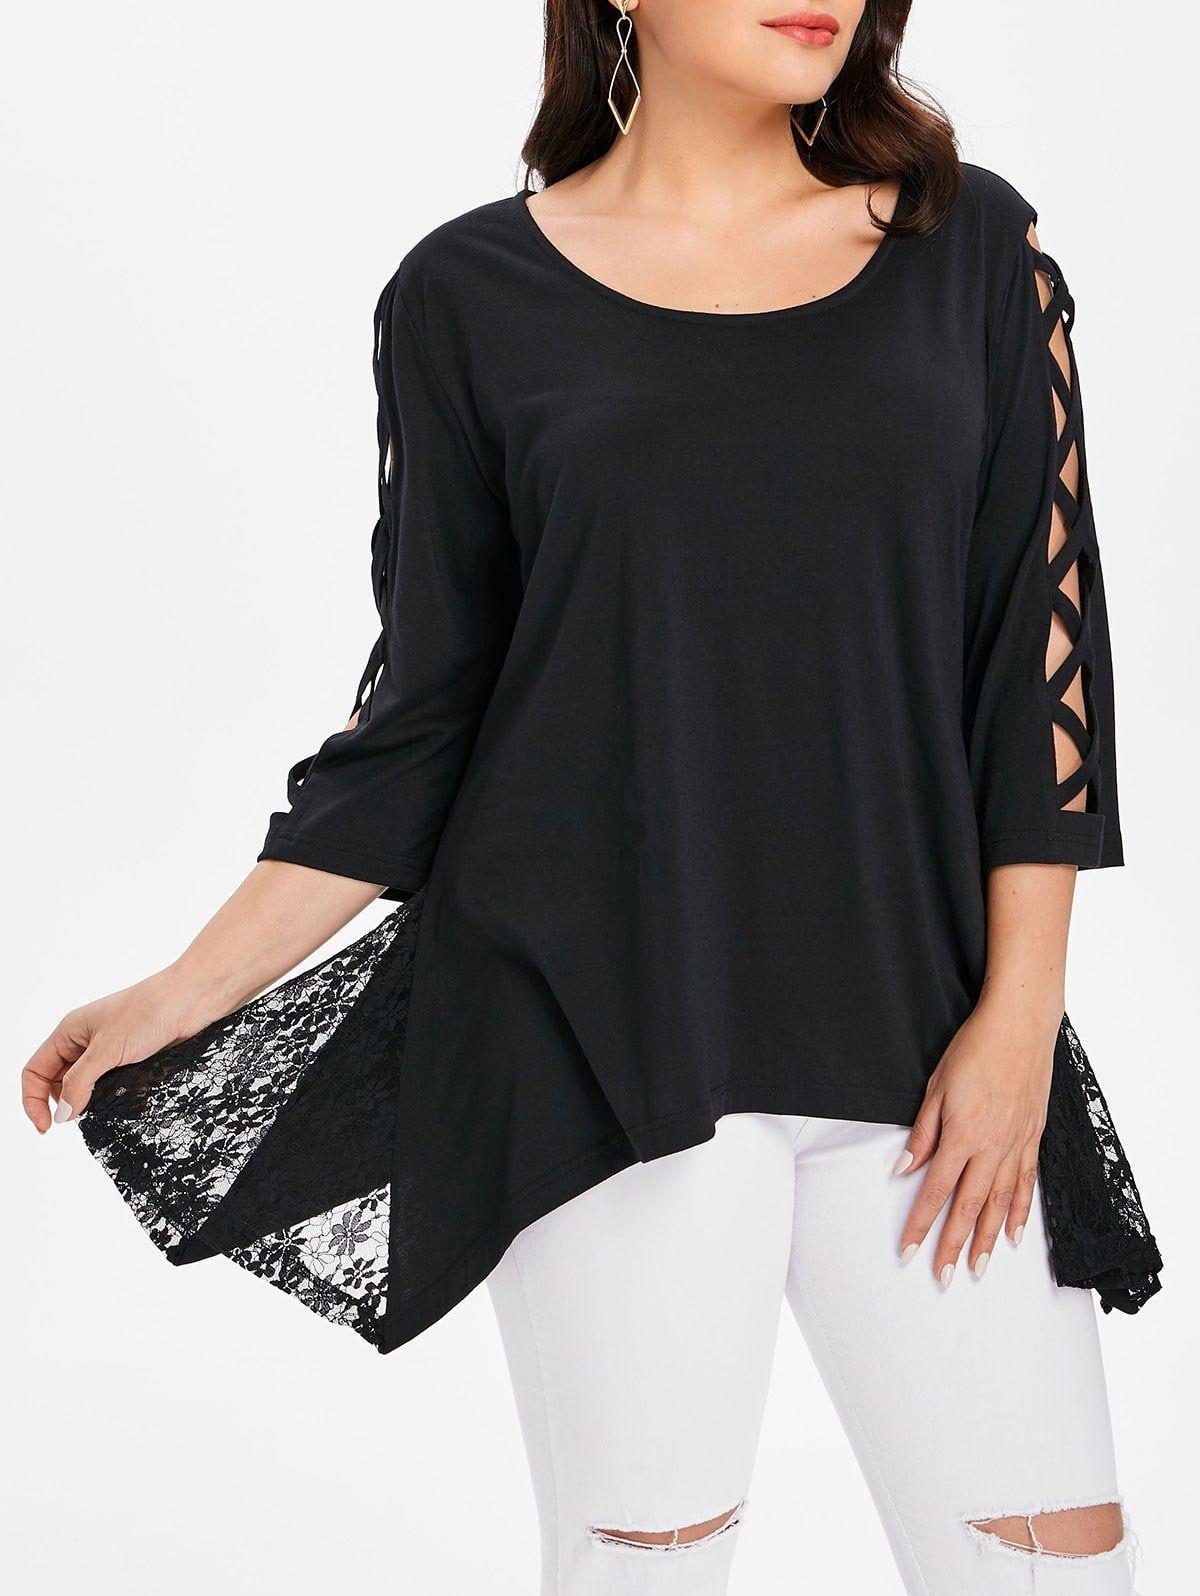 323a67fd7e3 Lace Panel Plus Size Asymmetrical Top  pretty blouses  beautiful blouses   designer blouses  holiday blouses  blouses outfit fall  womens blouses  fashion ...